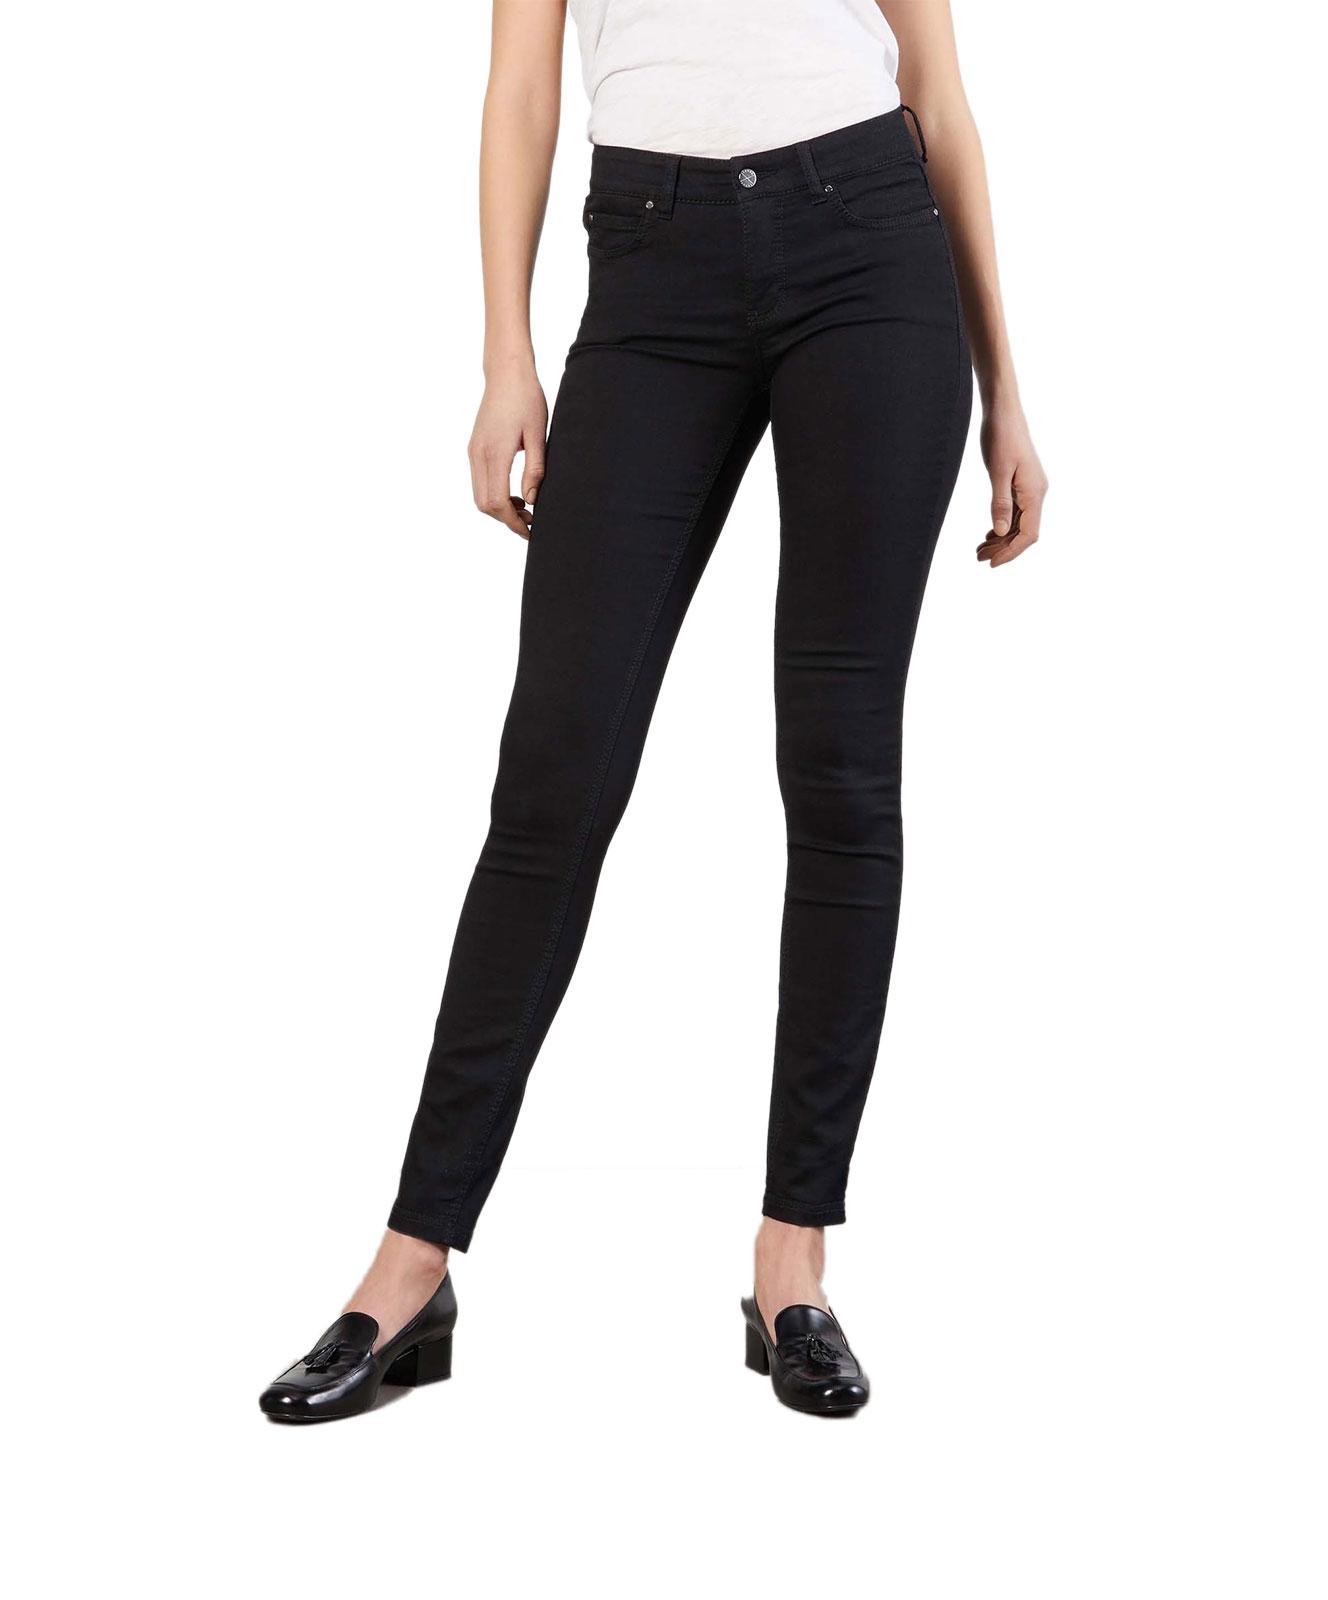 Hosen - MAC Jeans Röhre Dream Skinny in Black Black  - Onlineshop Jeans Meile